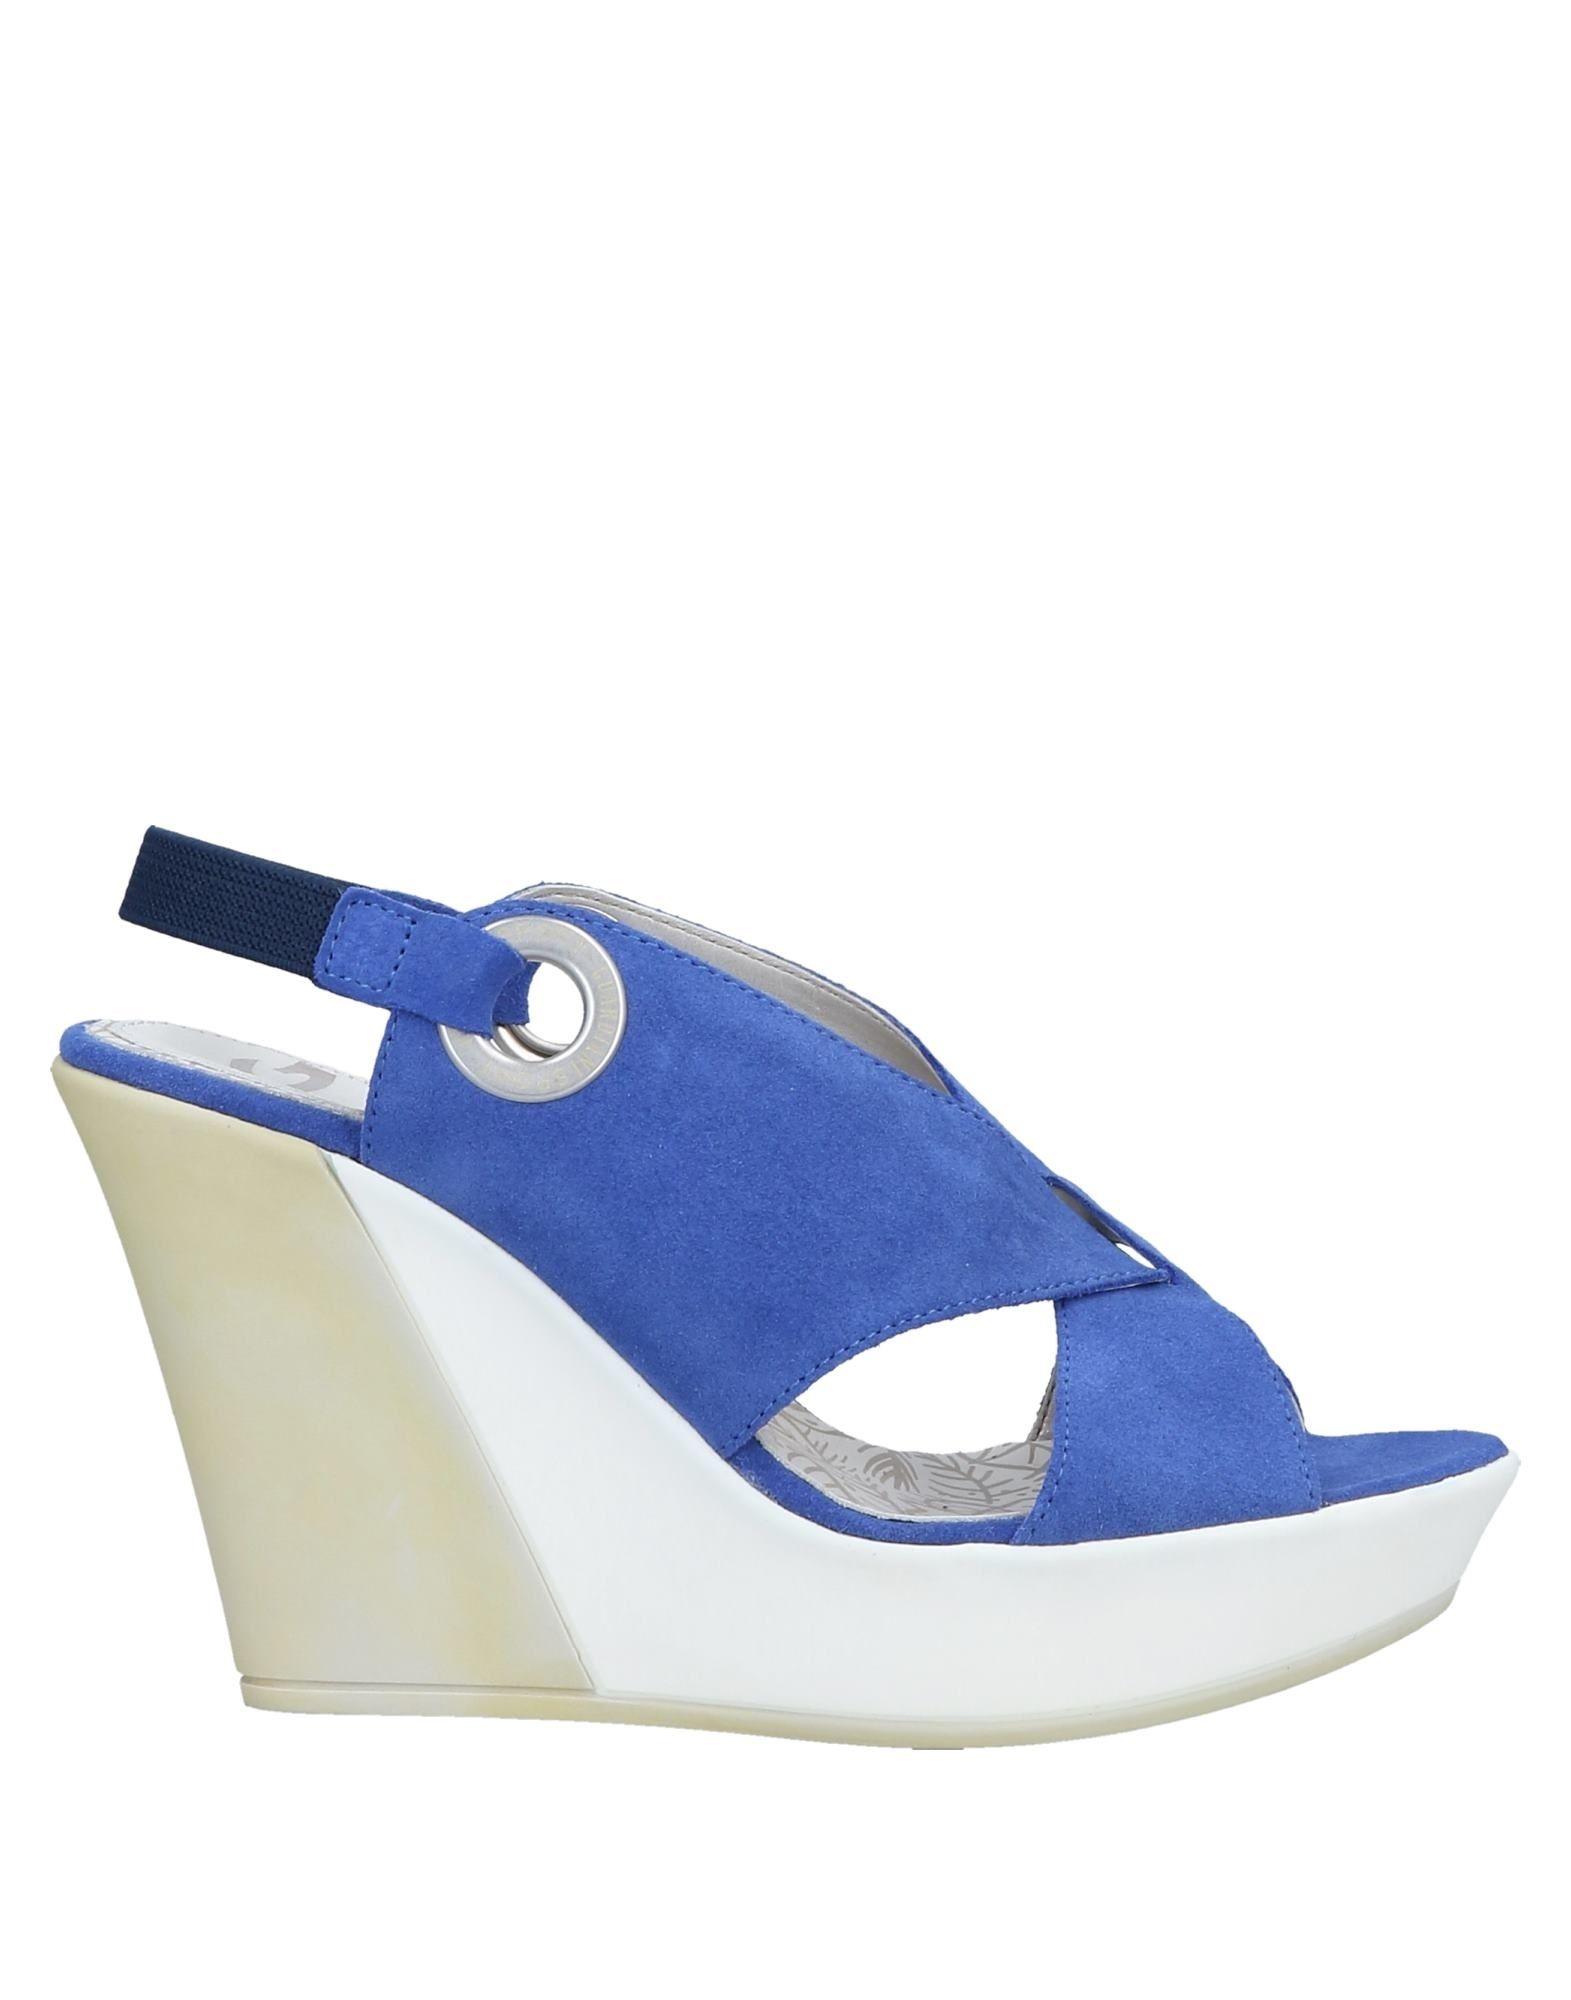 09ed222cc0d2 Alberto Guardiani Sandals - Women Women Women Alberto Guardiani Sandals  online on United Kingdom - 11561537PB d31988